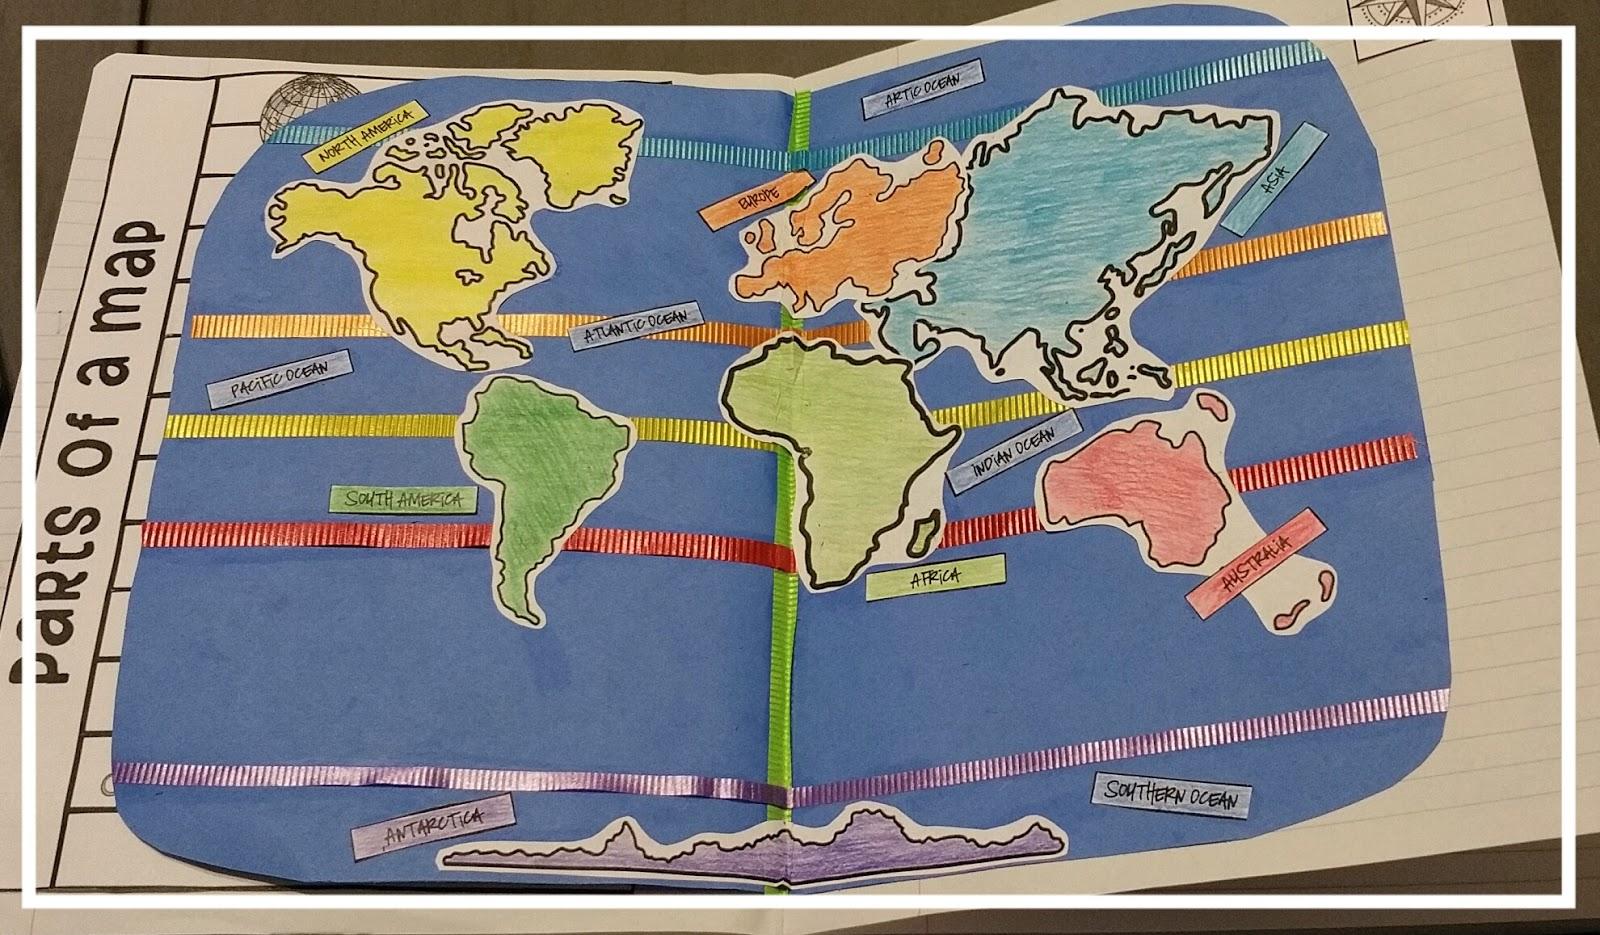 Teel S Treats The World Interactive Notebook Activity